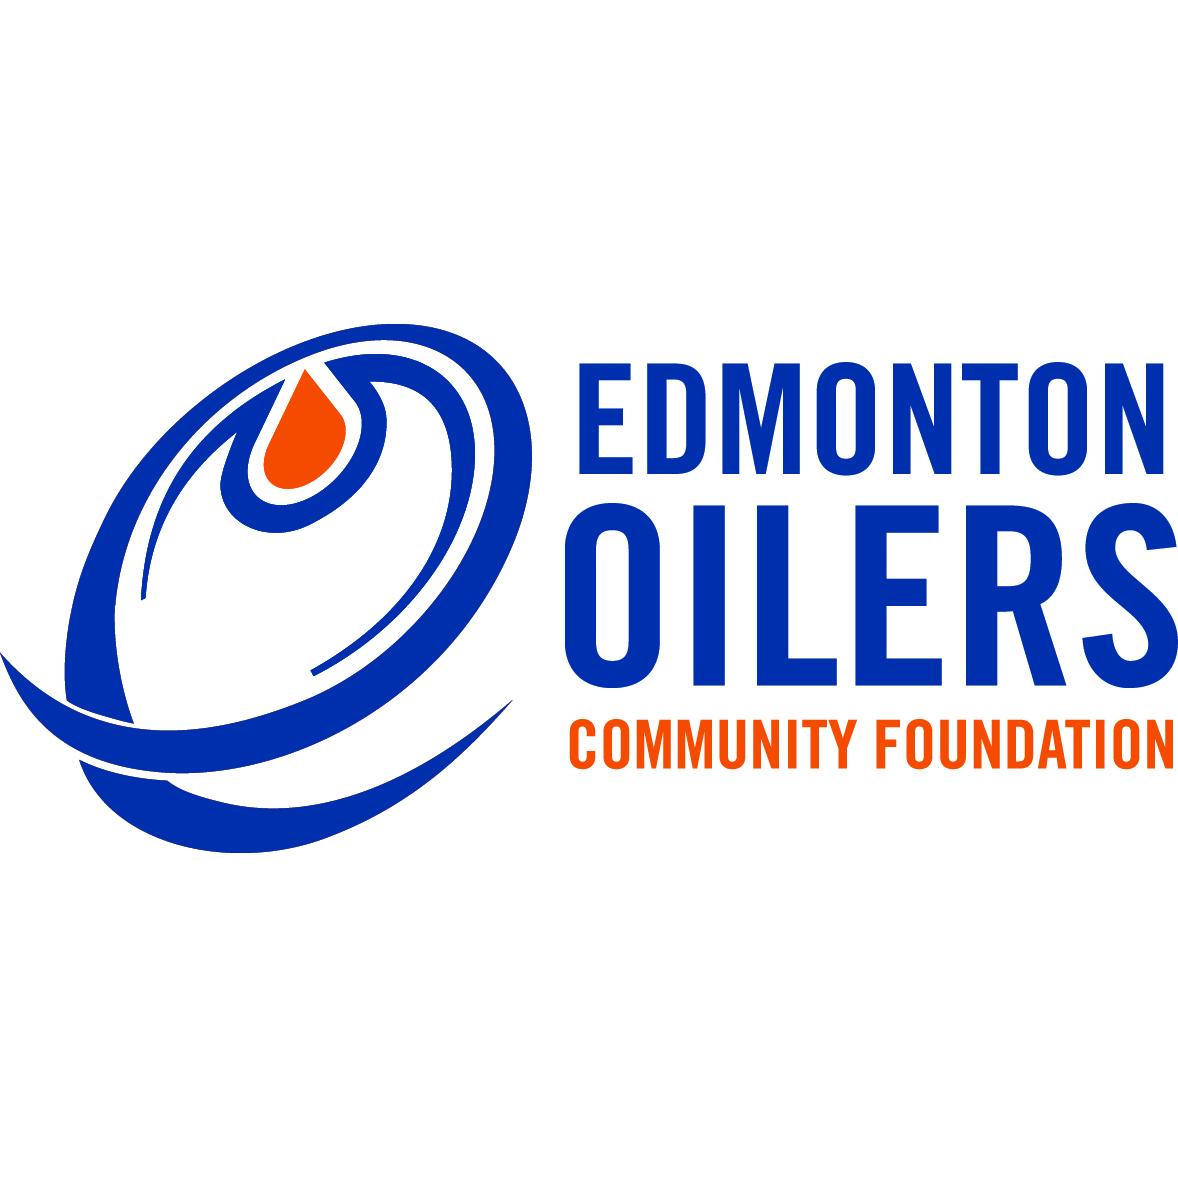 Edmonton Oilers Community Foundation